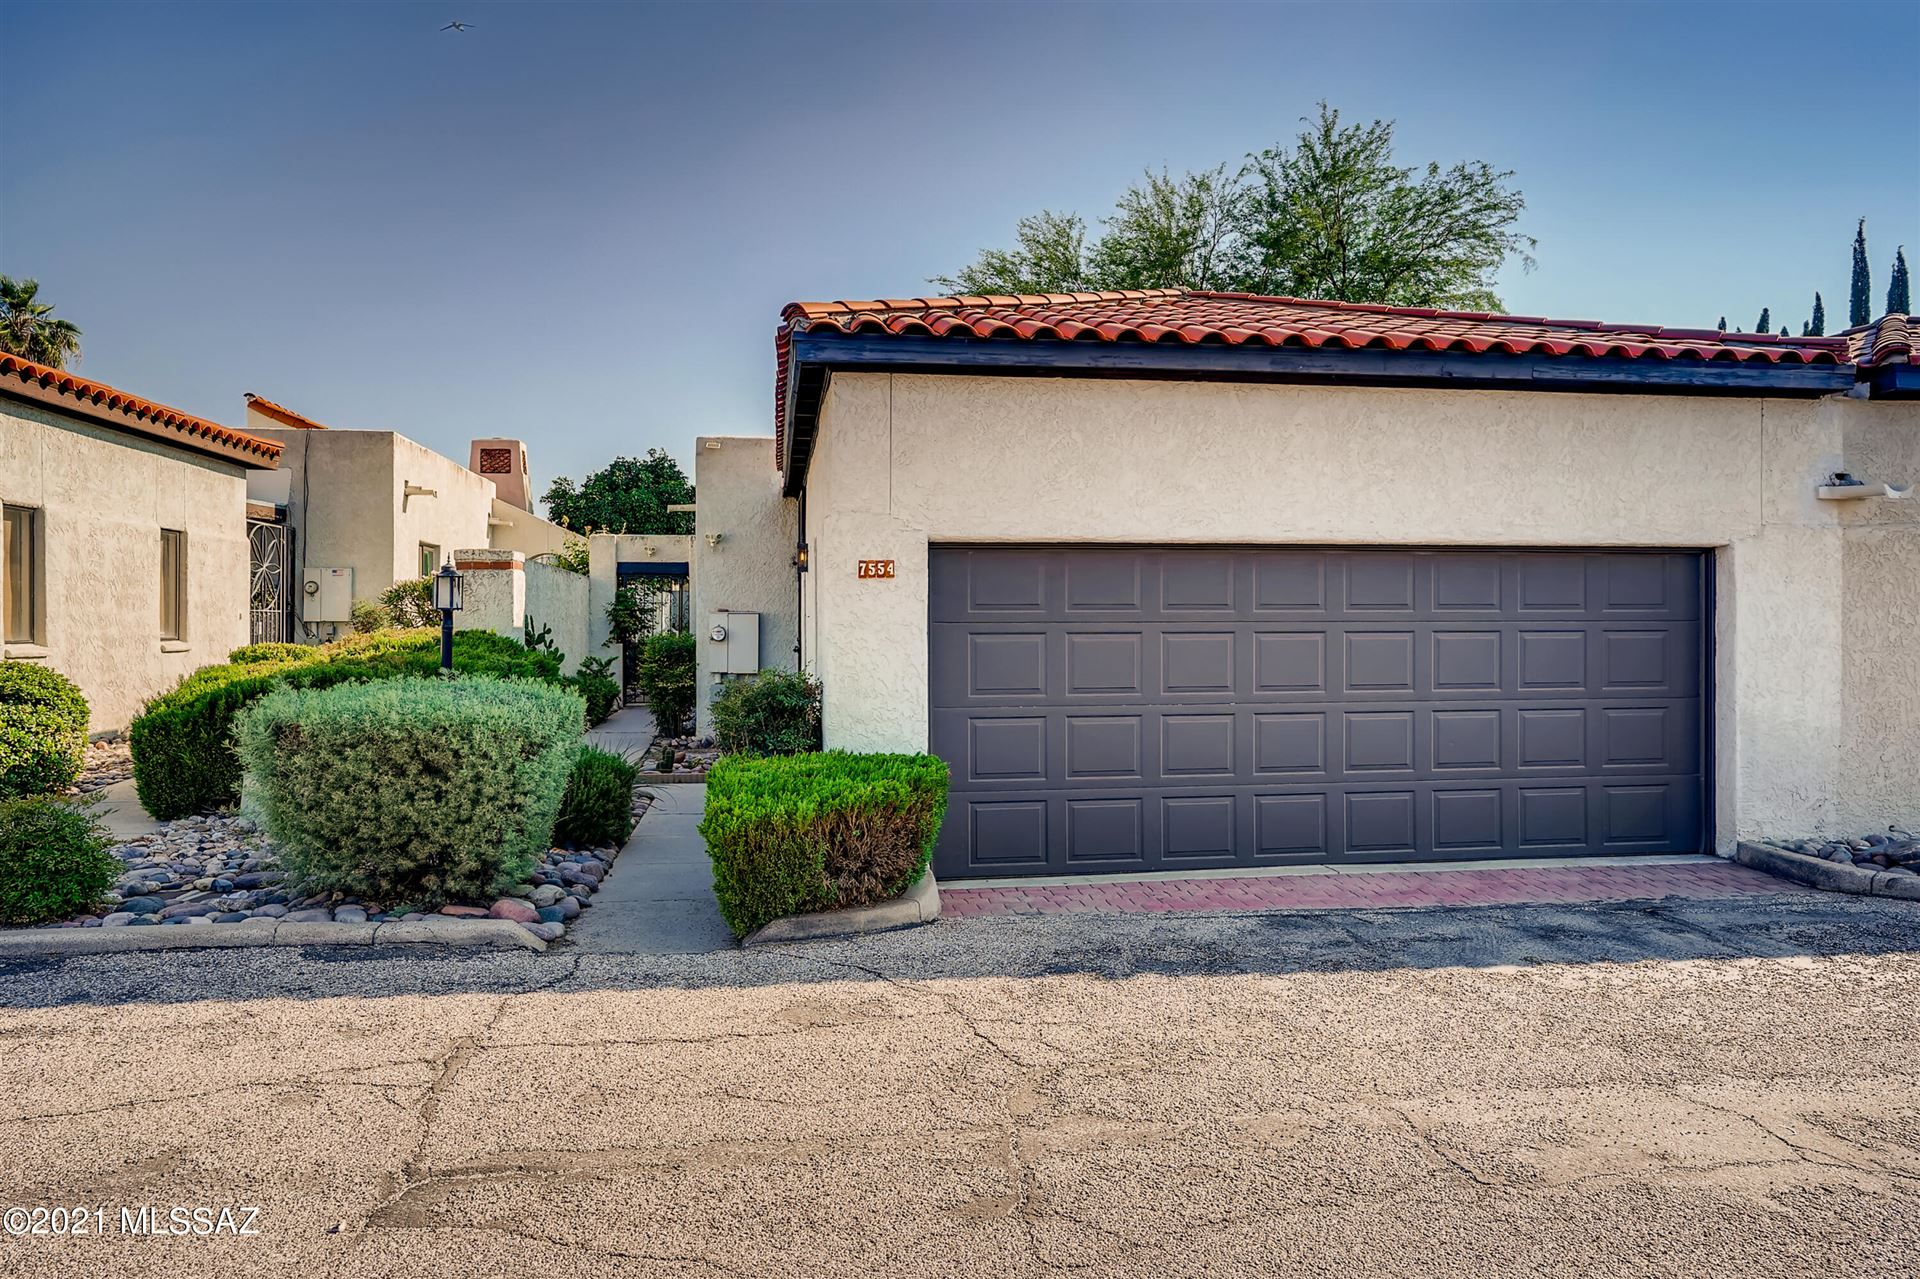 7554 E Via Cornucopia, Tucson, AZ 85715 - MLS#: 22123943